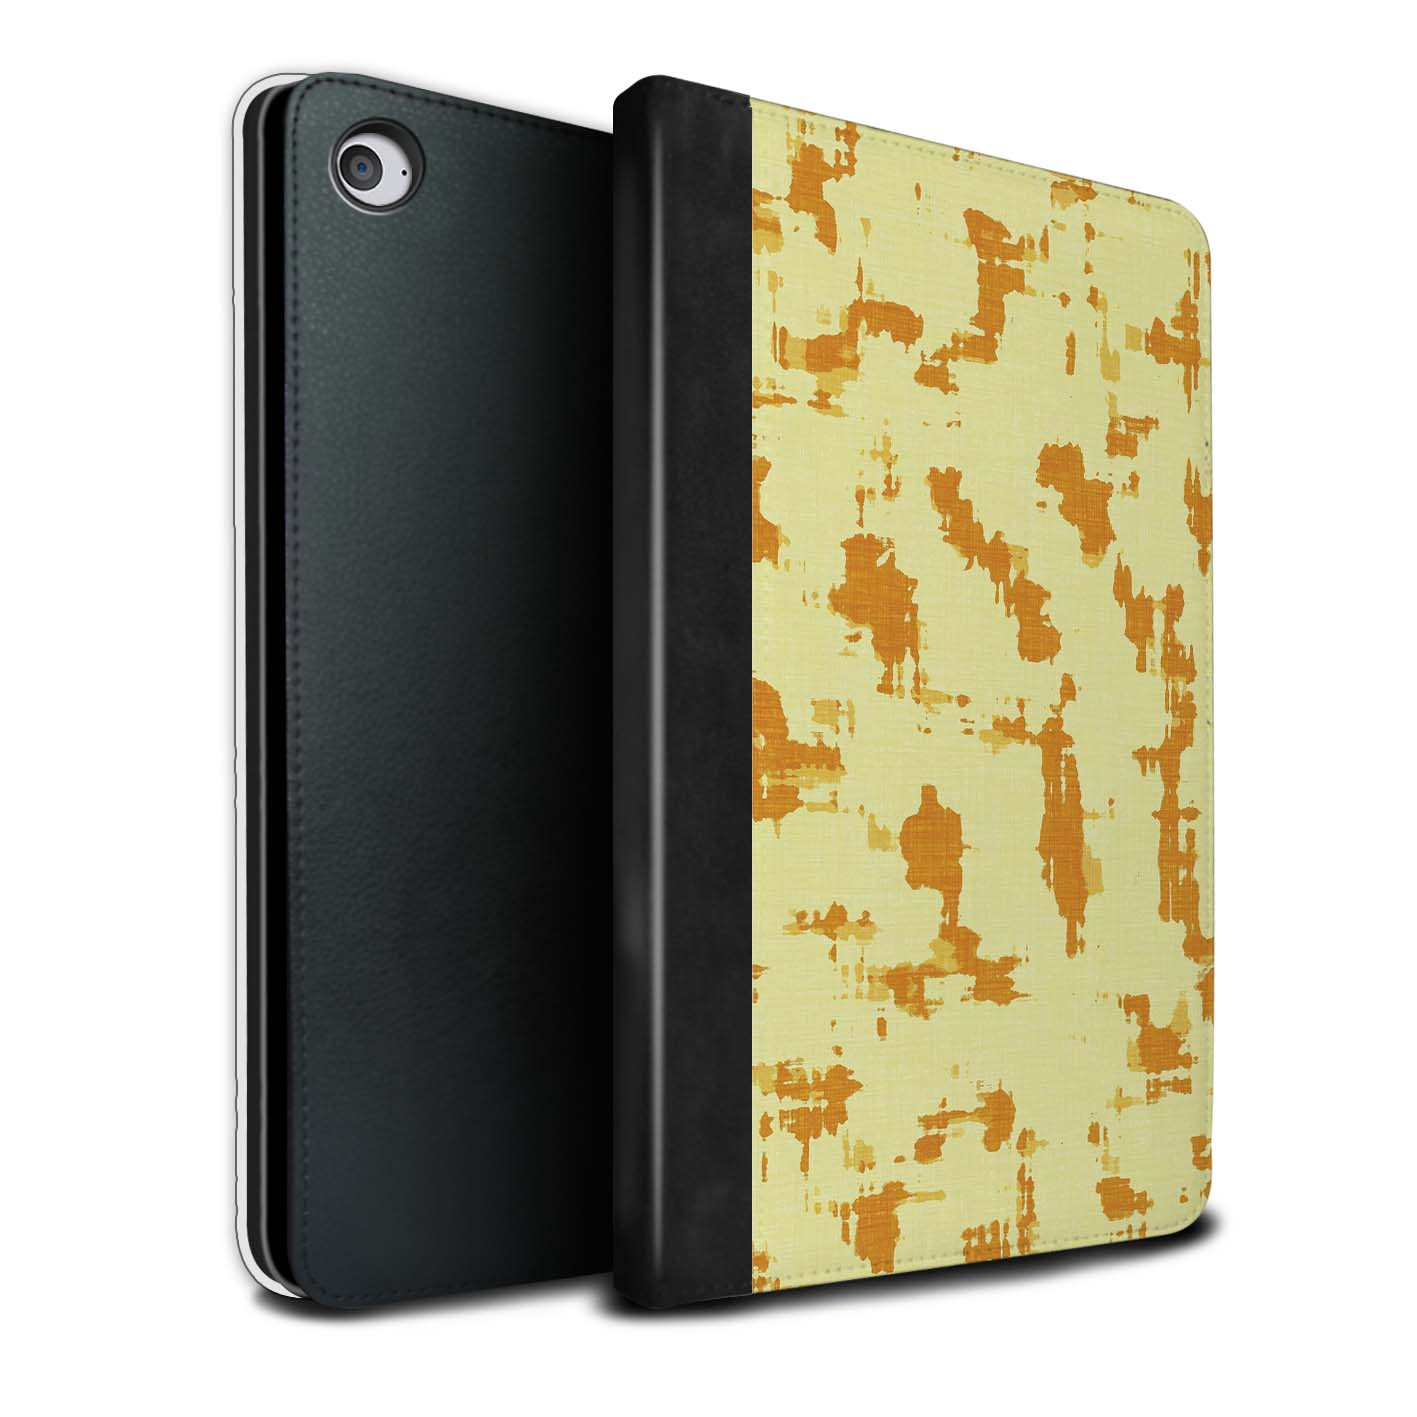 STUFF4-Coque-Etui-Case-Cuir-PU-pour-Apple-iPad-Mini-4-Yellow-Fashion